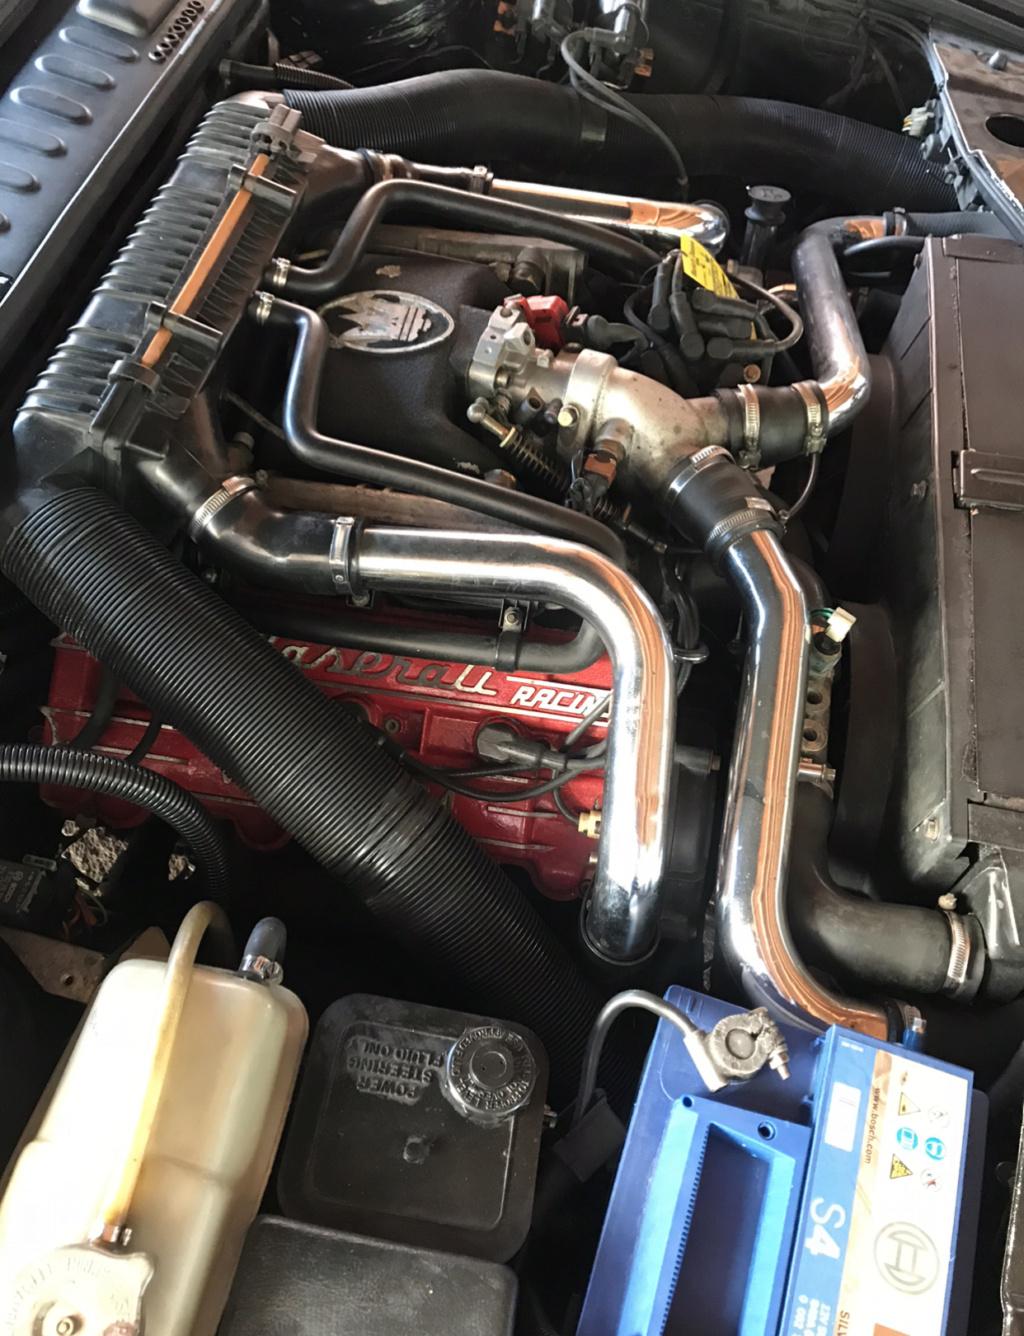 La mia prima Maserati: Racing o 3200GT? - Pagina 2 B5ee6210